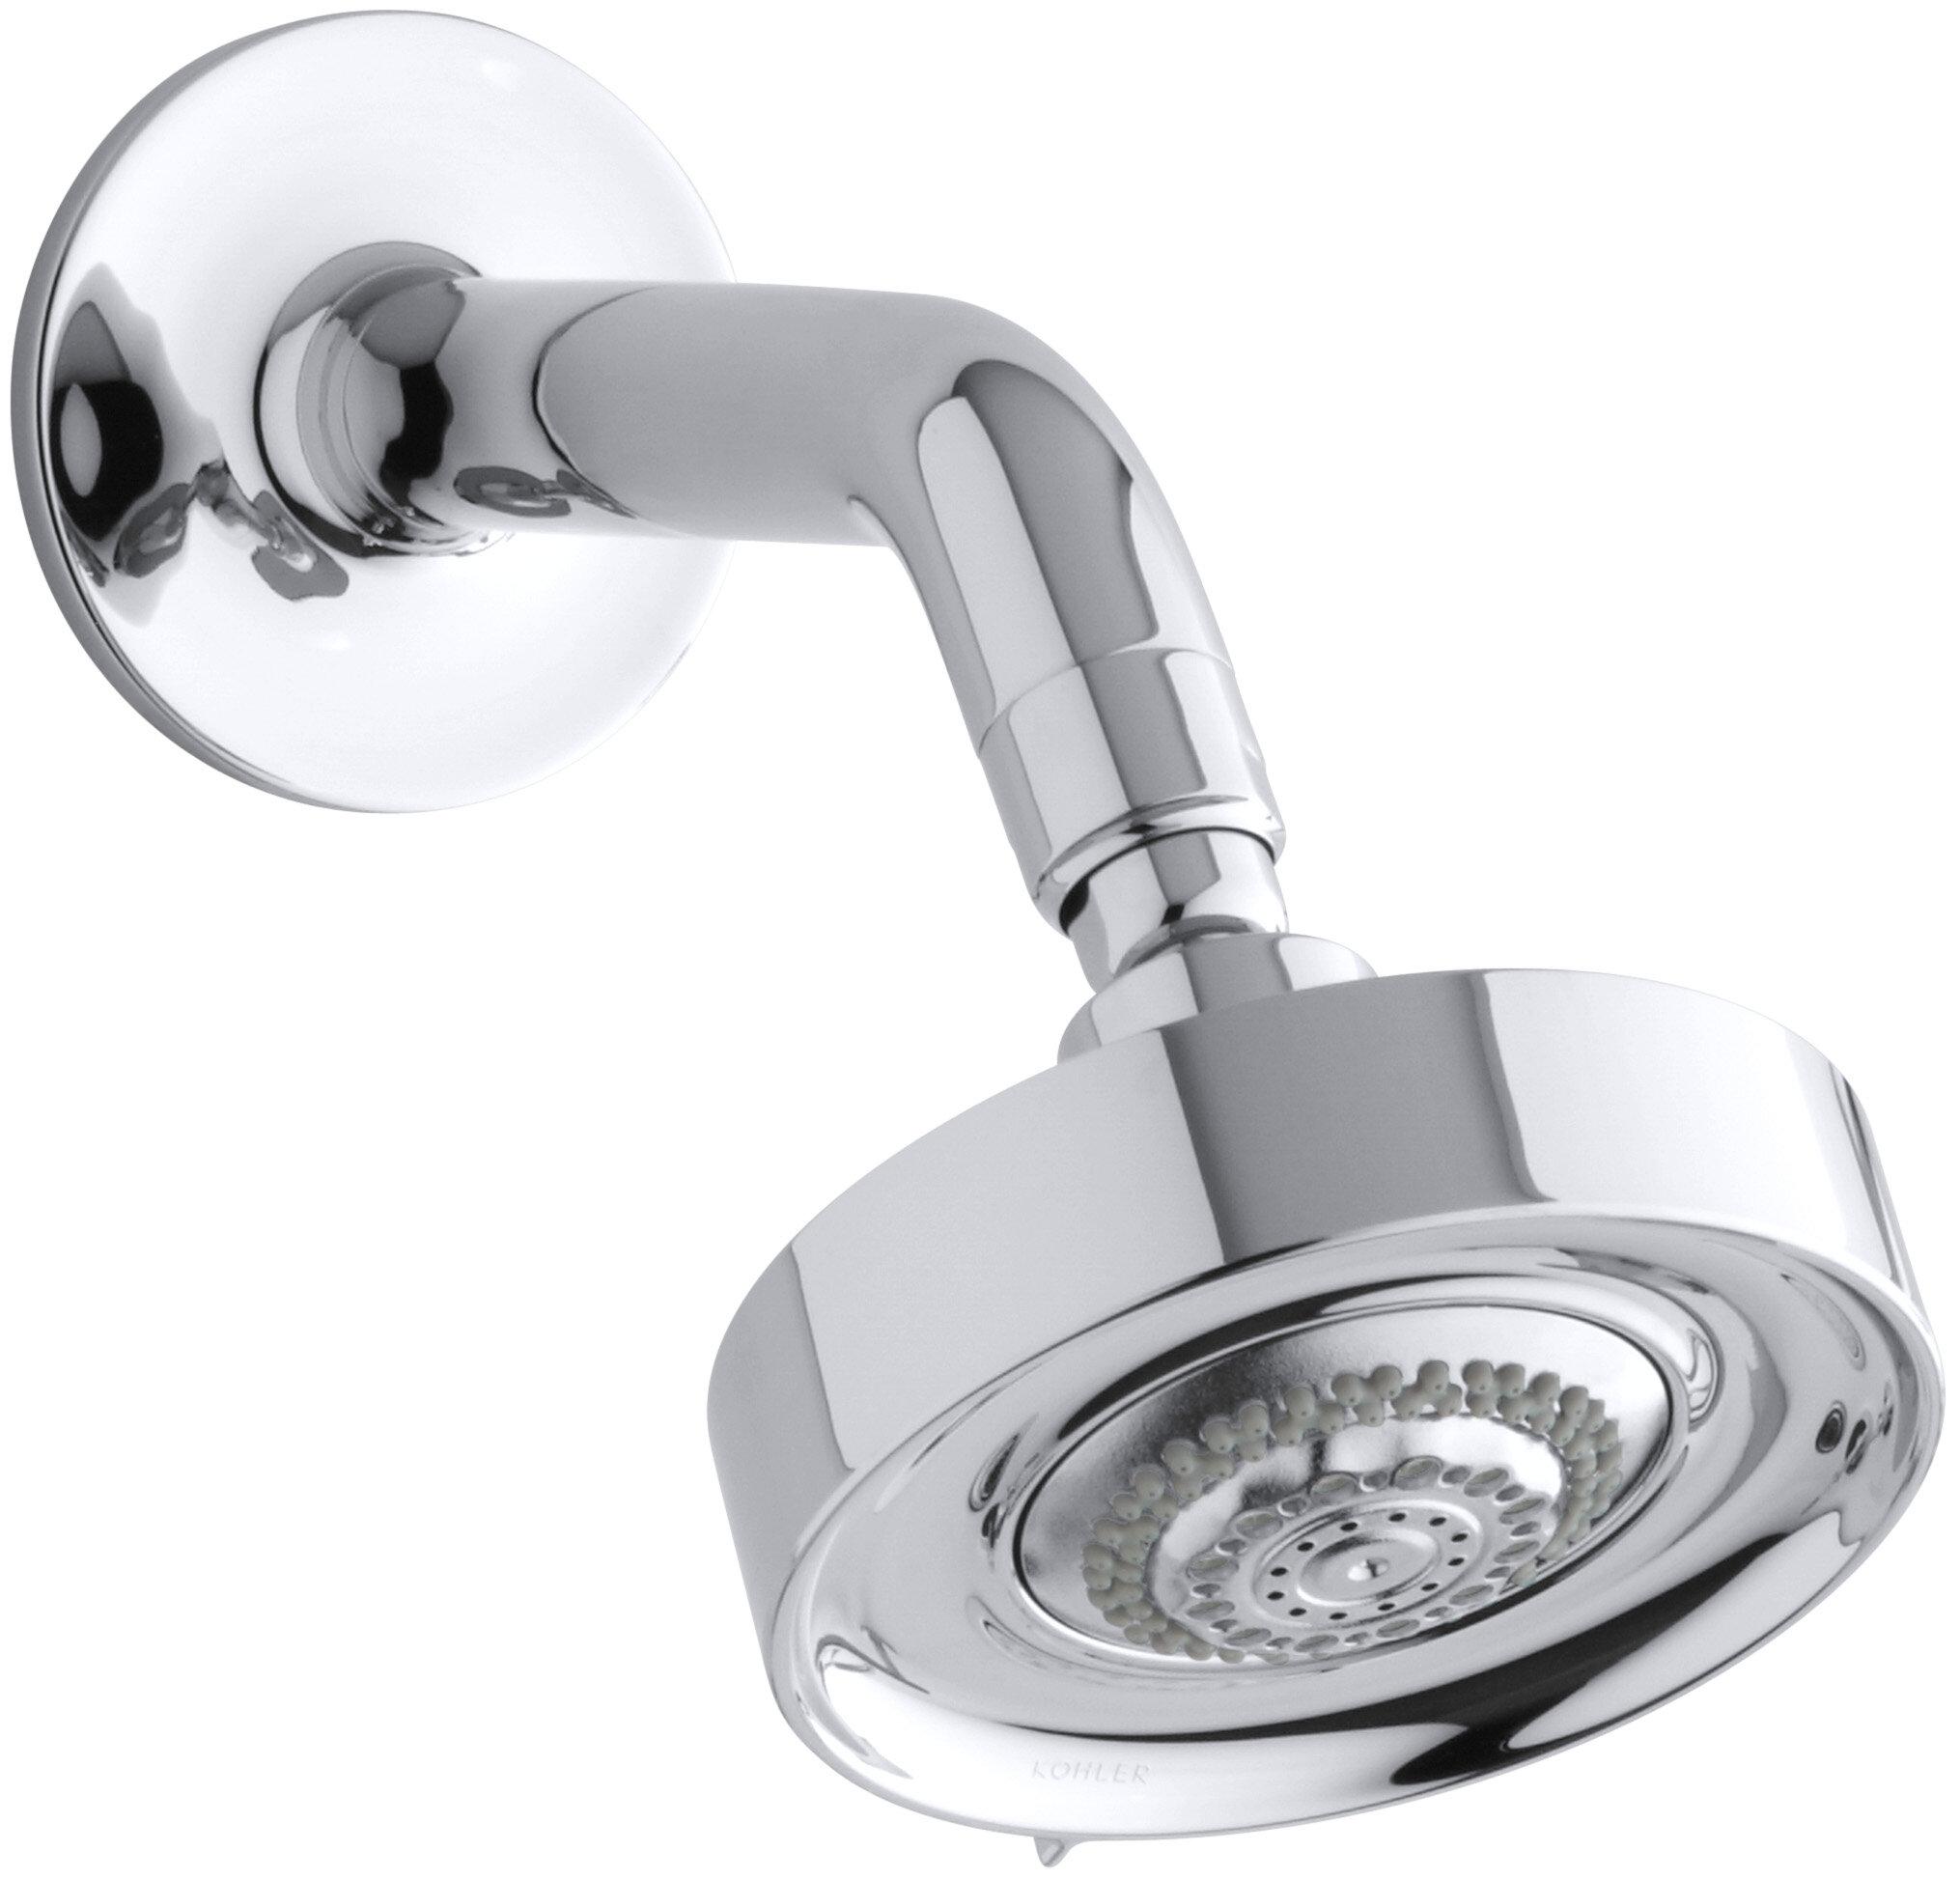 enliven ga heads filtered glancing handheld speakman page brushed smart shower chrome nickel ideal picture head hand adjustments held